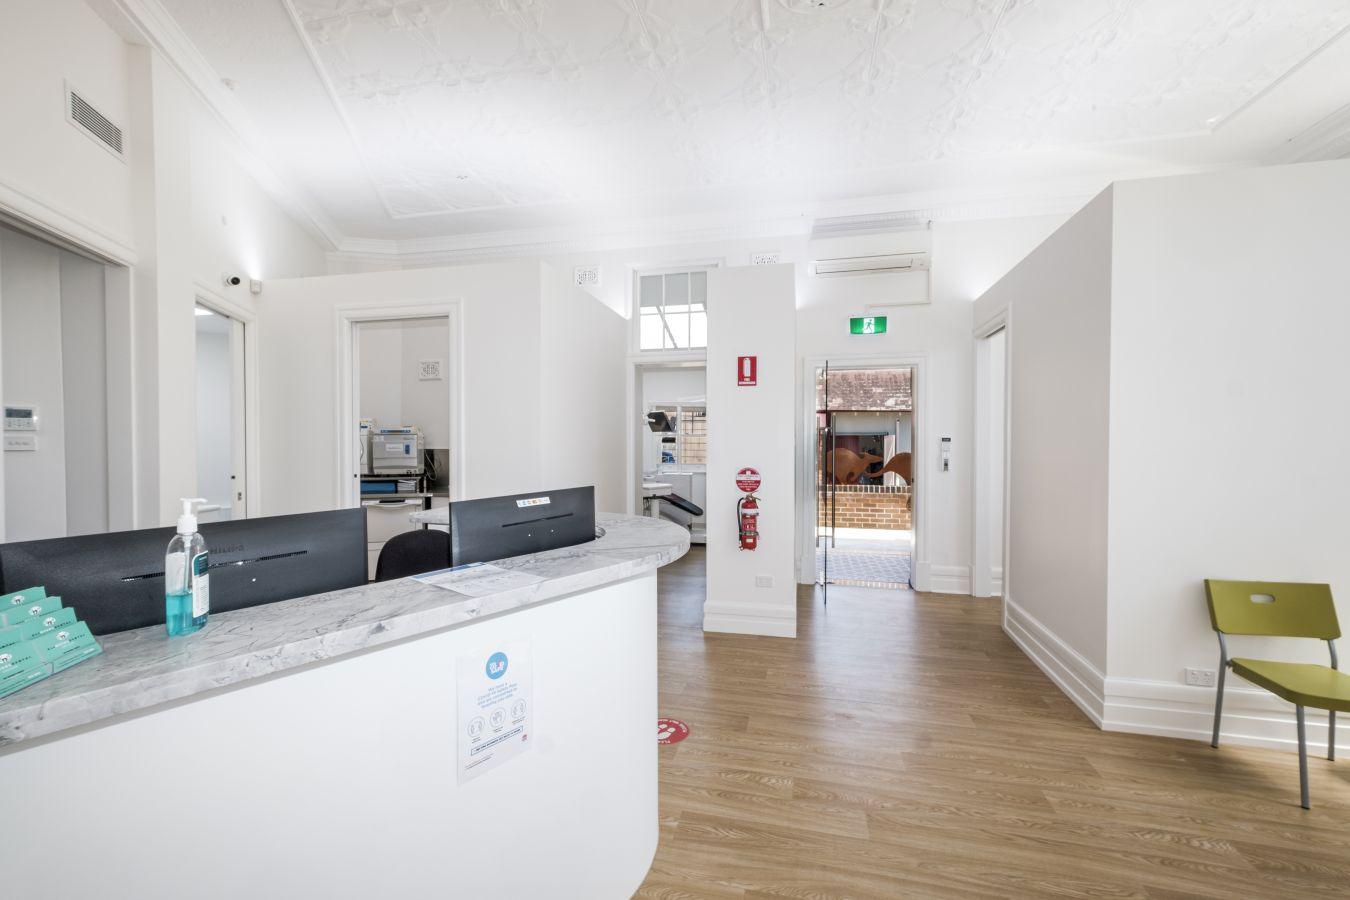 All Needs Dental Croydon reception area